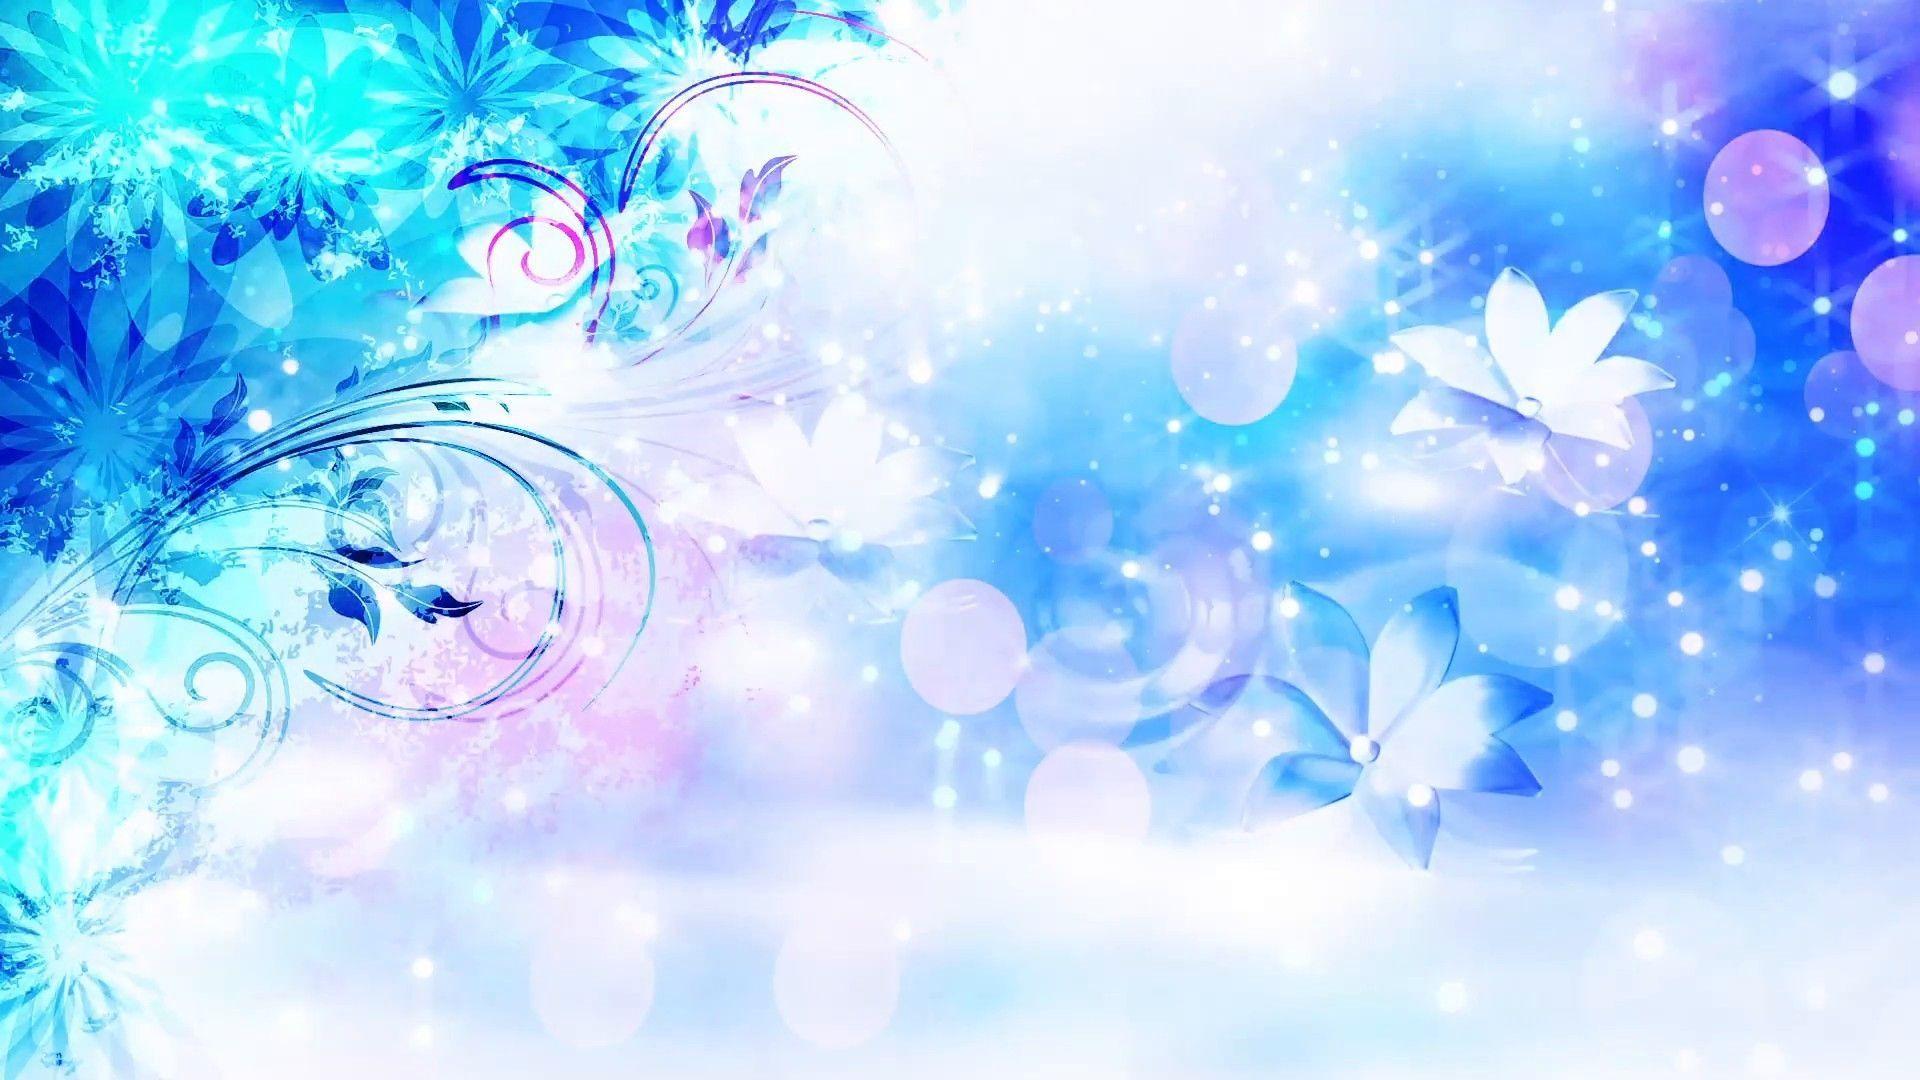 Cute Blue full hd wallpaper for laptop